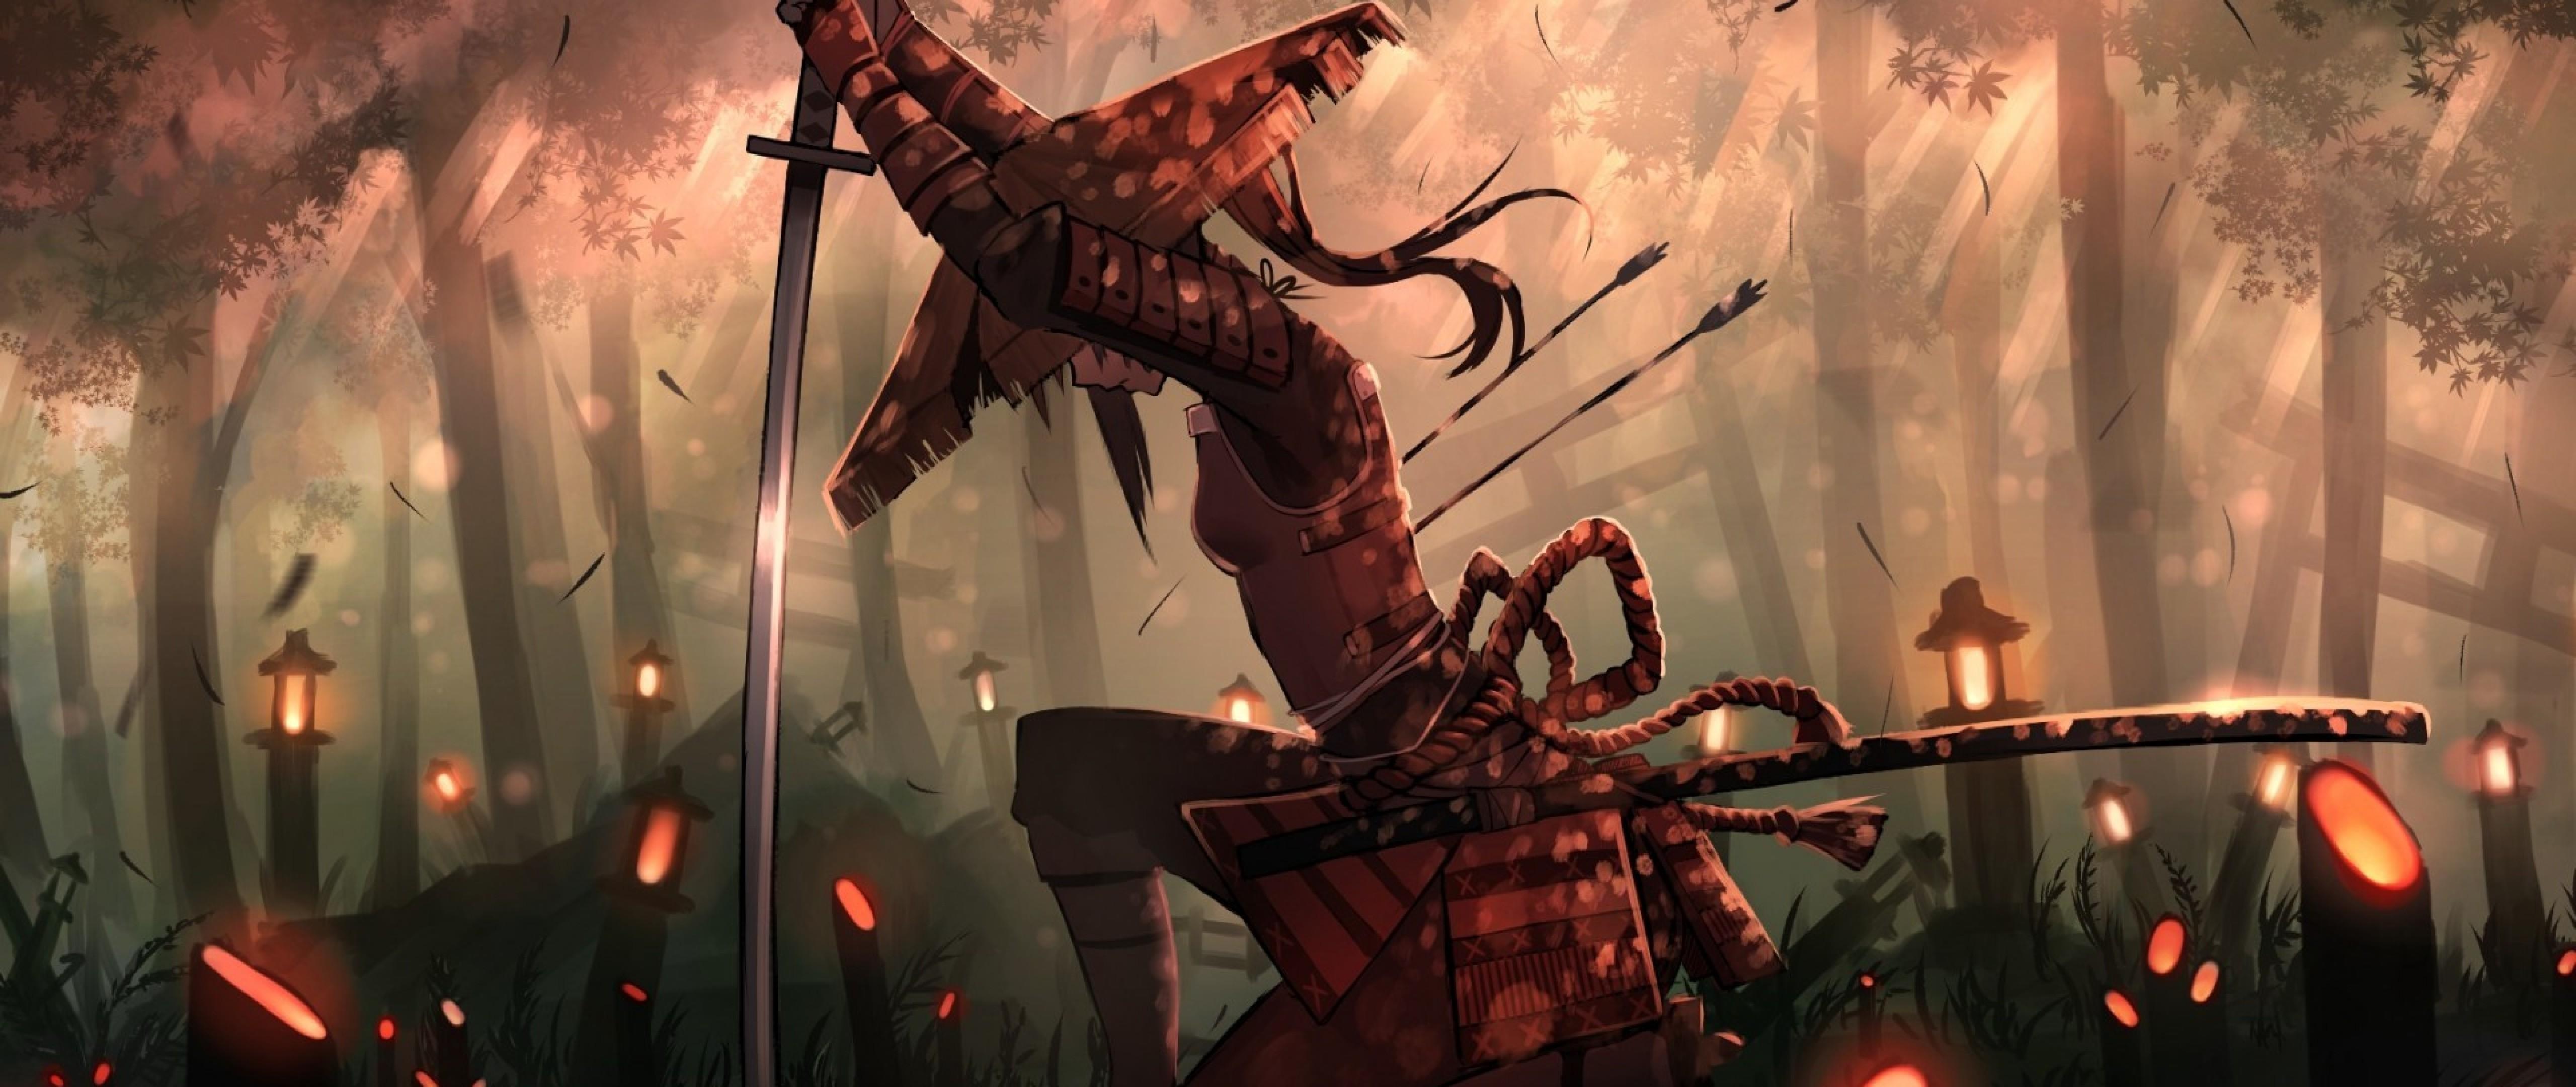 Anime samurai girl HD Wallpaper 4K Ultra HD Wide TV - HD ...